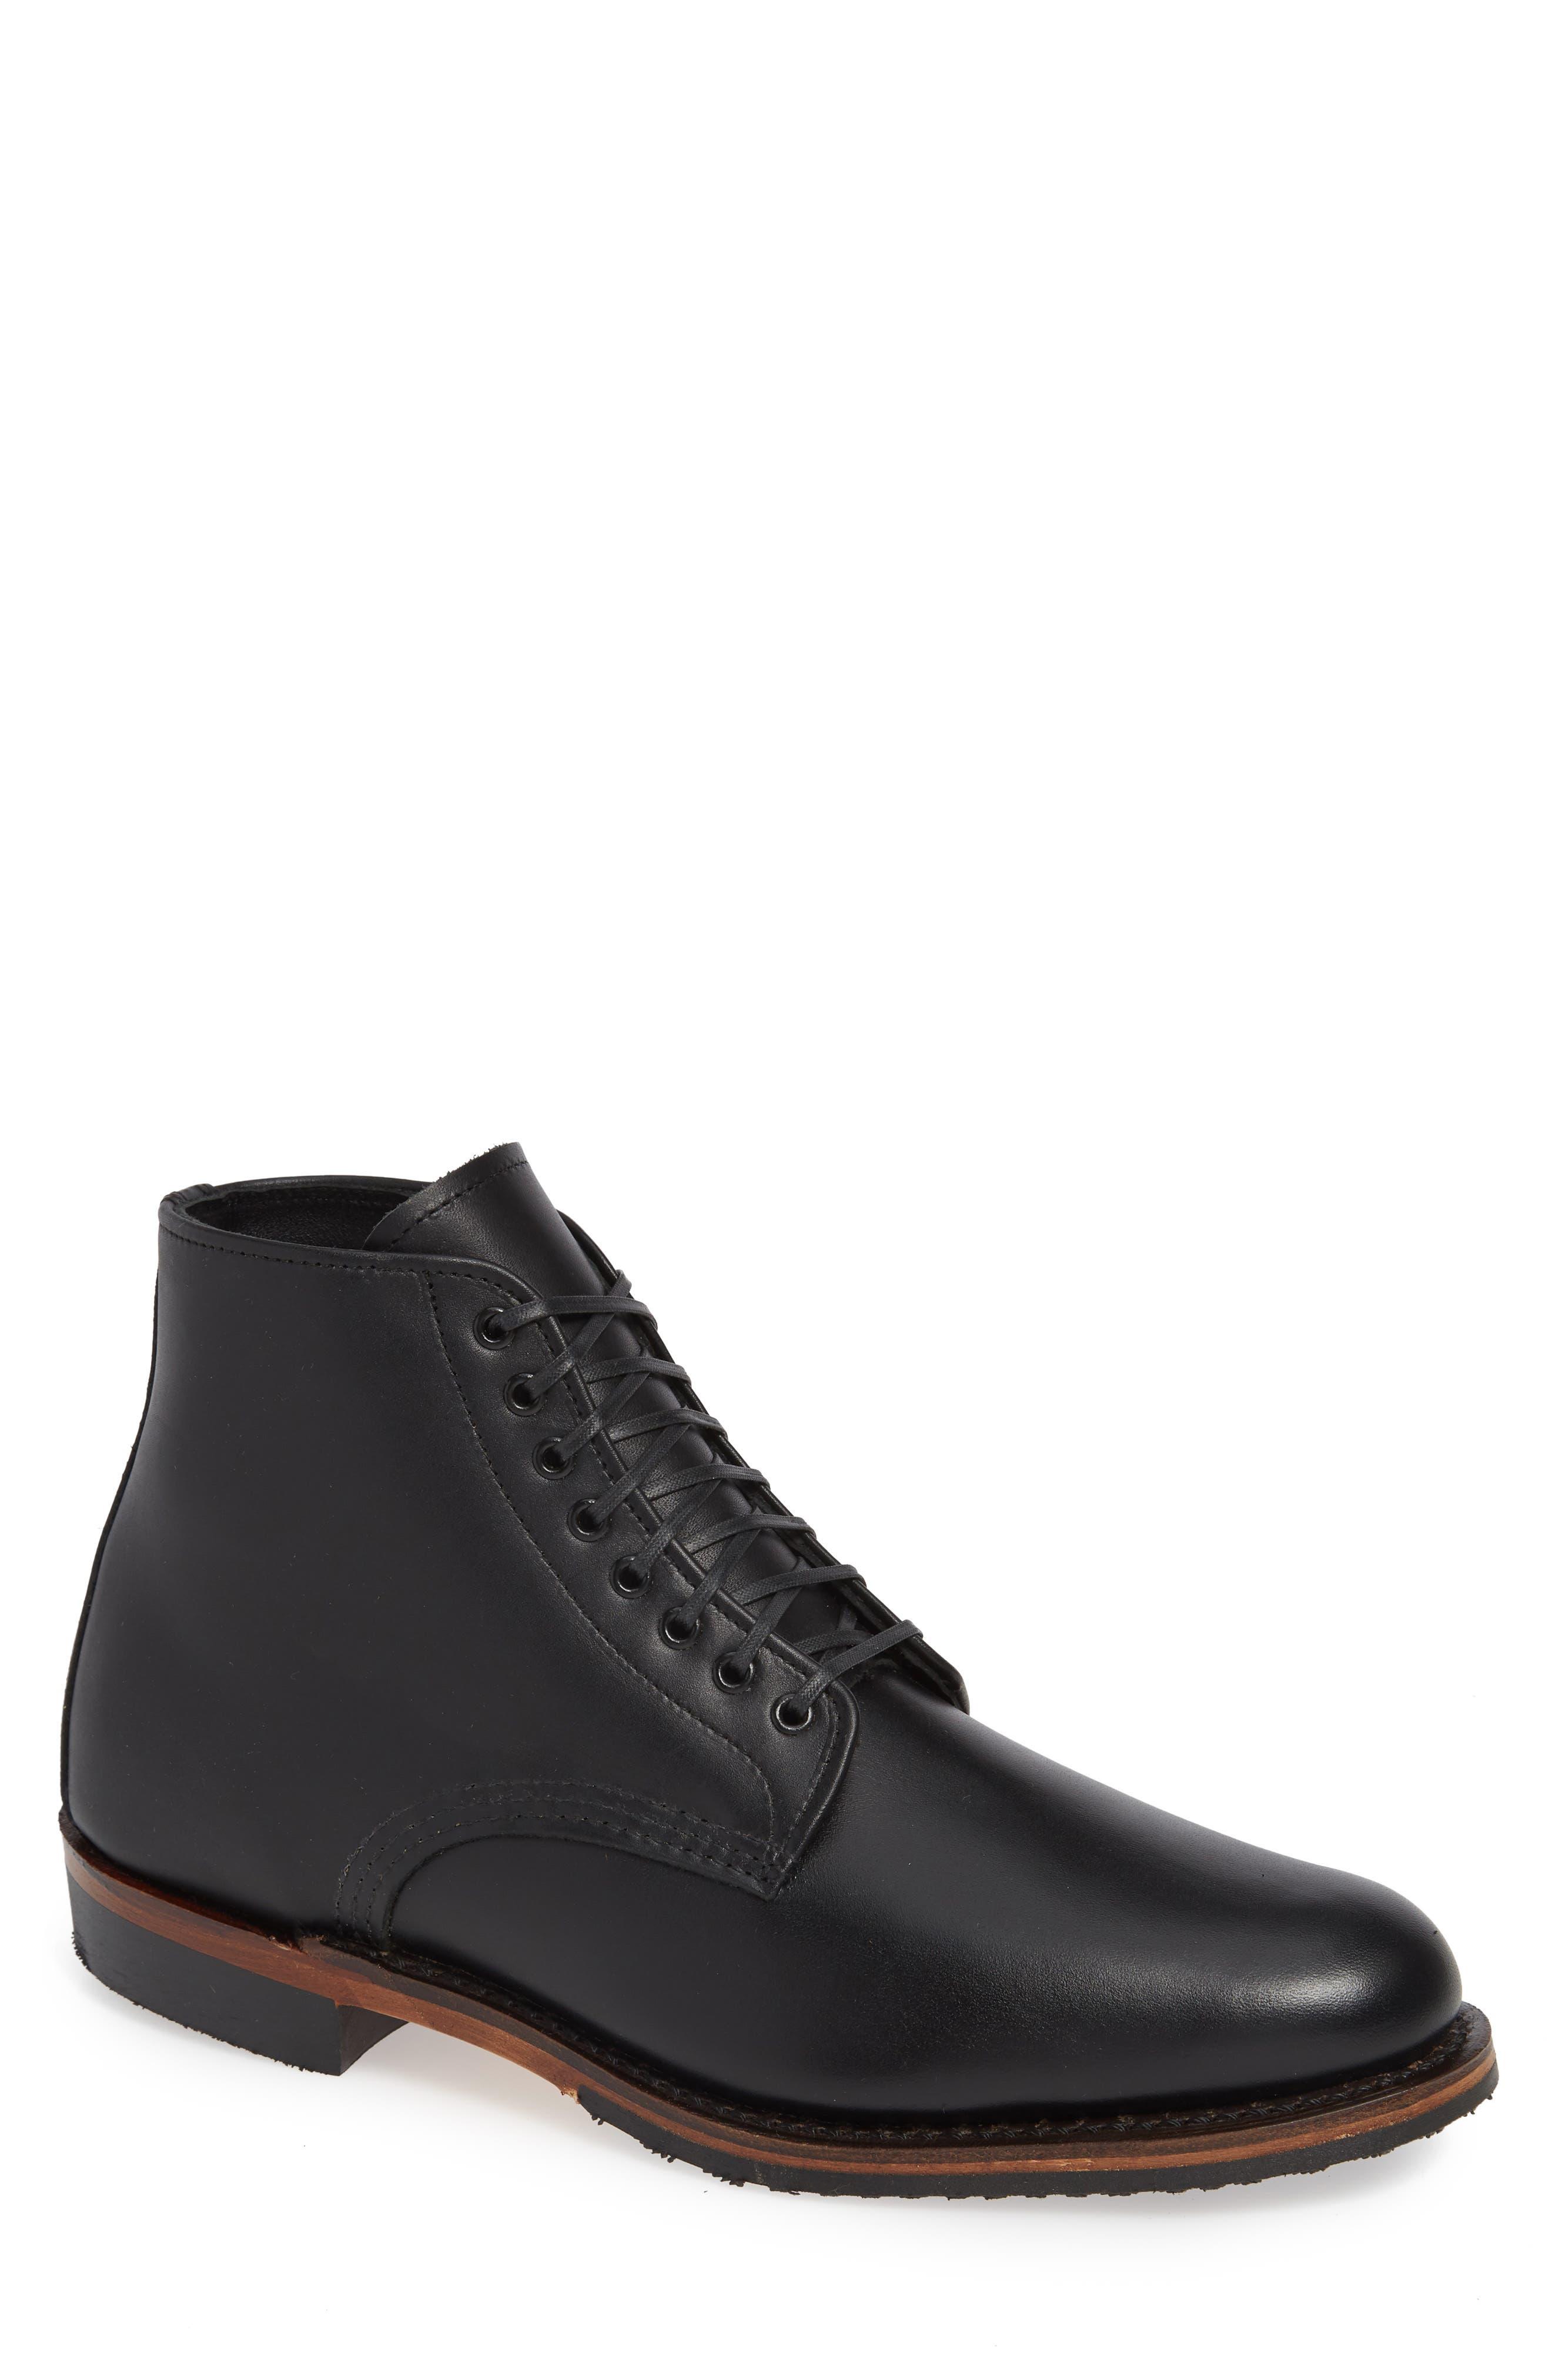 Red Wing Williston Plain Toe Boot- Black